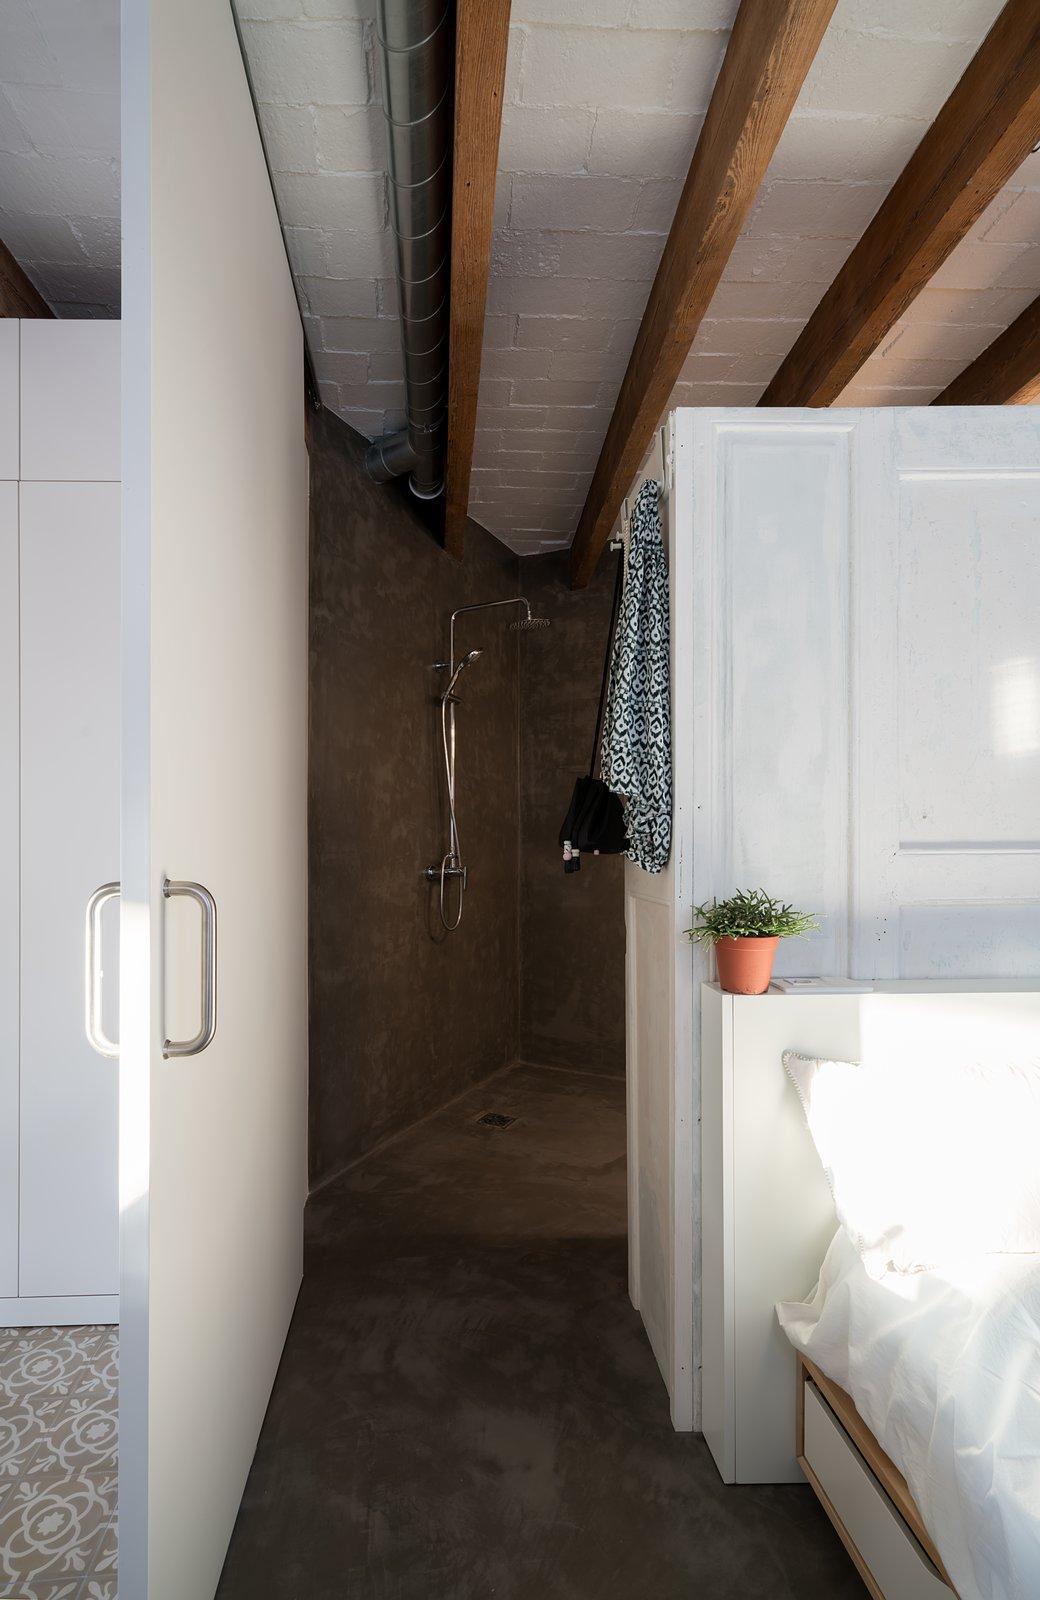 Bathroom  Old Town Refurbishment by Habitan Architects